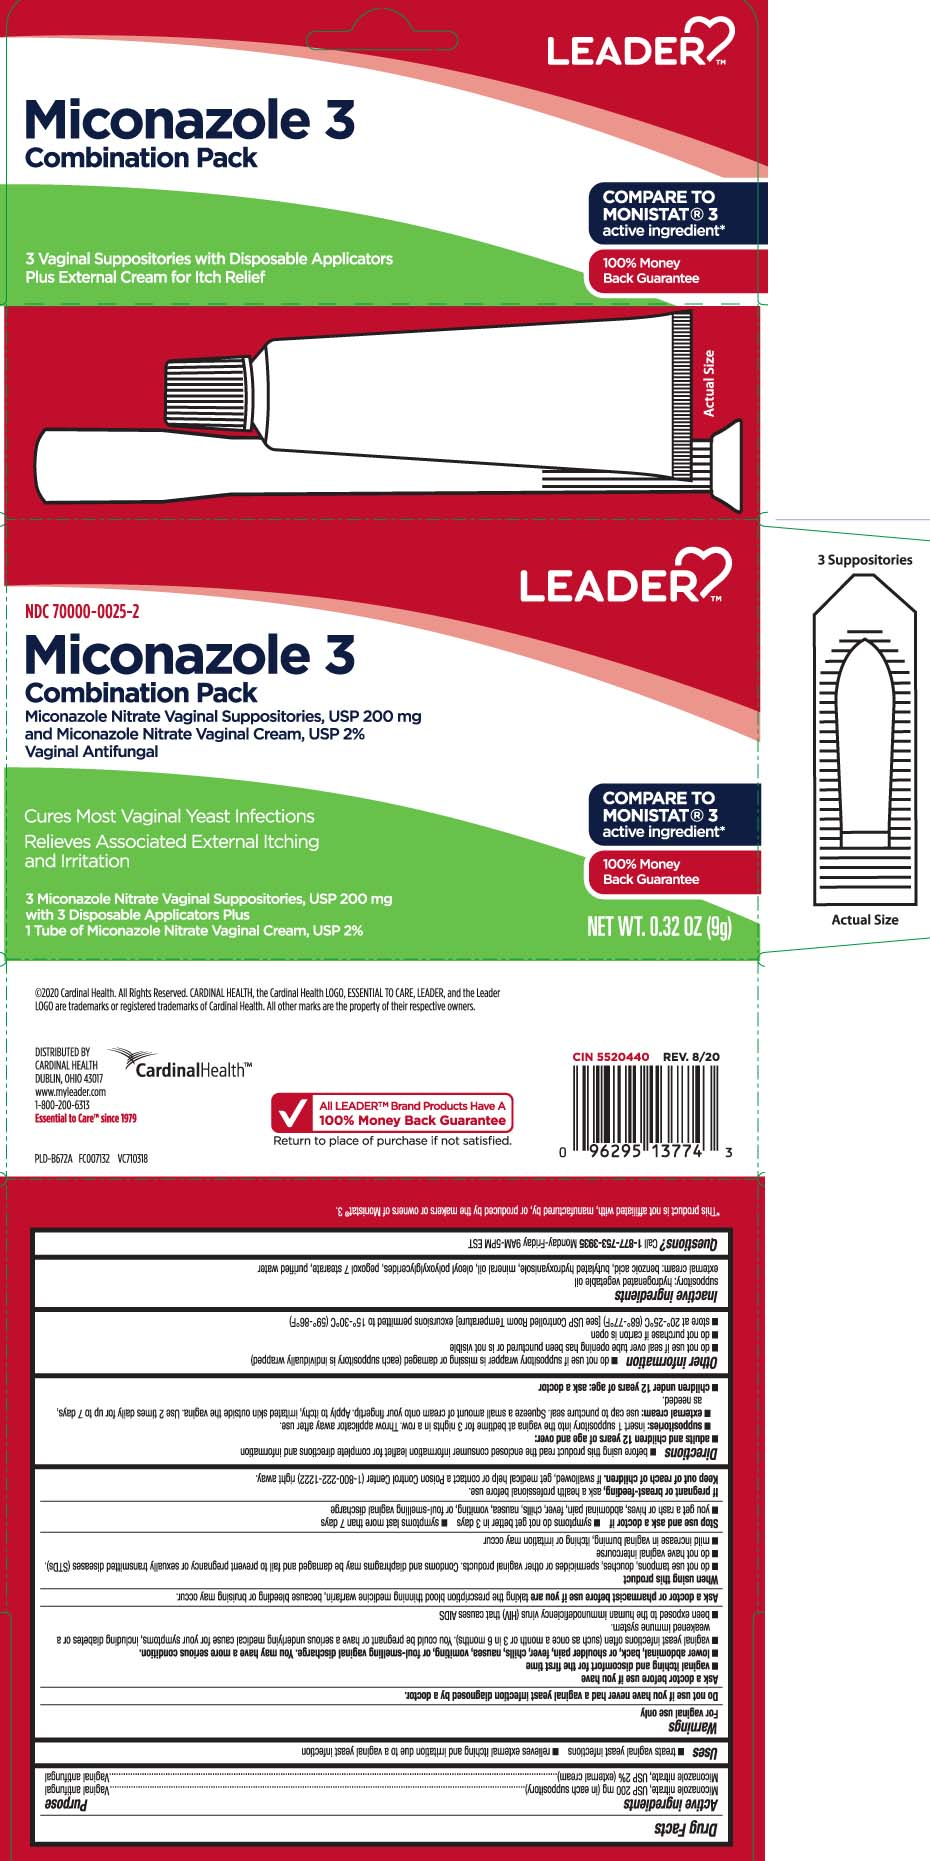 miconazole nitrate (Miconazole 3 Combination Pack)